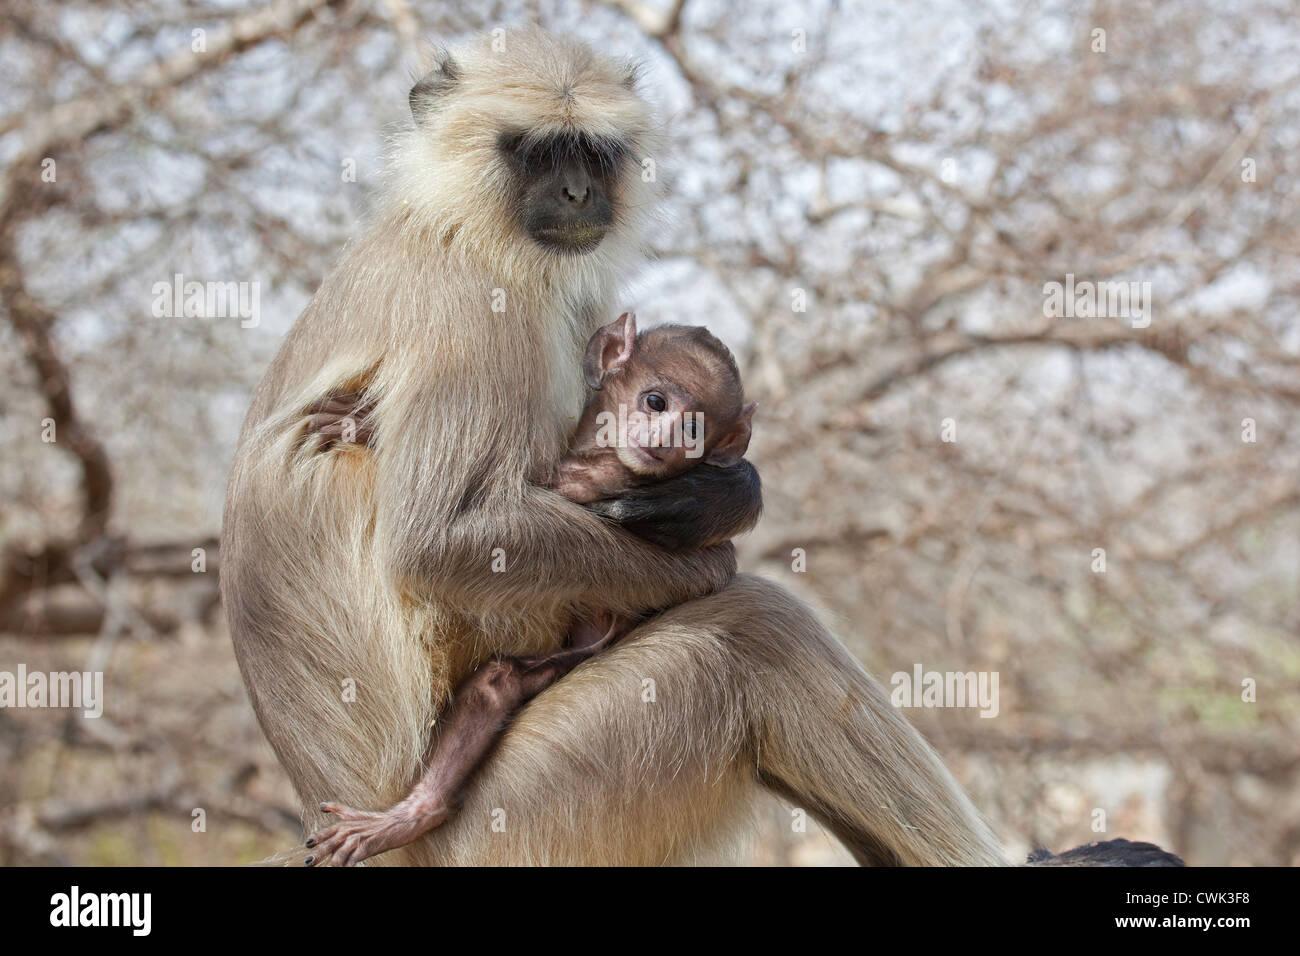 Gris / langur Hanuman langur (Semnopithecus entellus) con el bebé, el Parque nacional de Ranthambore, Sawai Imagen De Stock